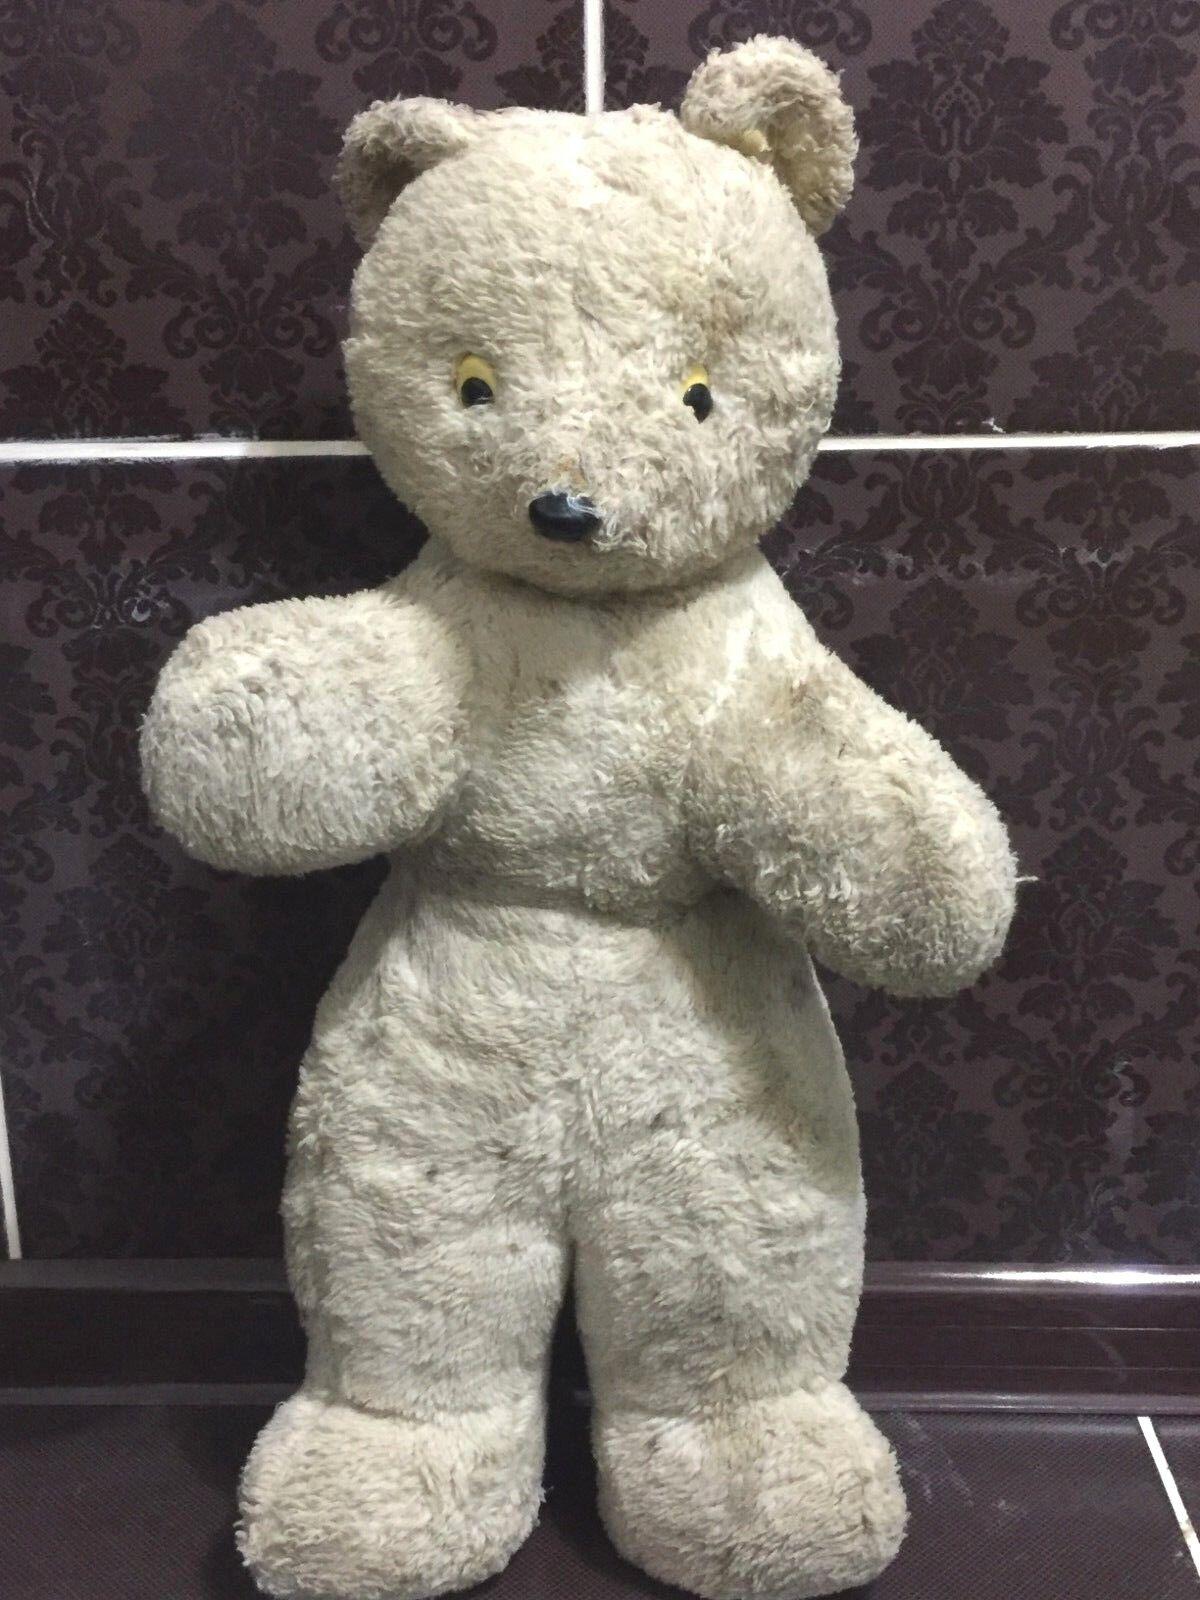 Rare Vintage Soviet 1950s Toy USSR Plush Bear Sawdust Big Size 53 cm